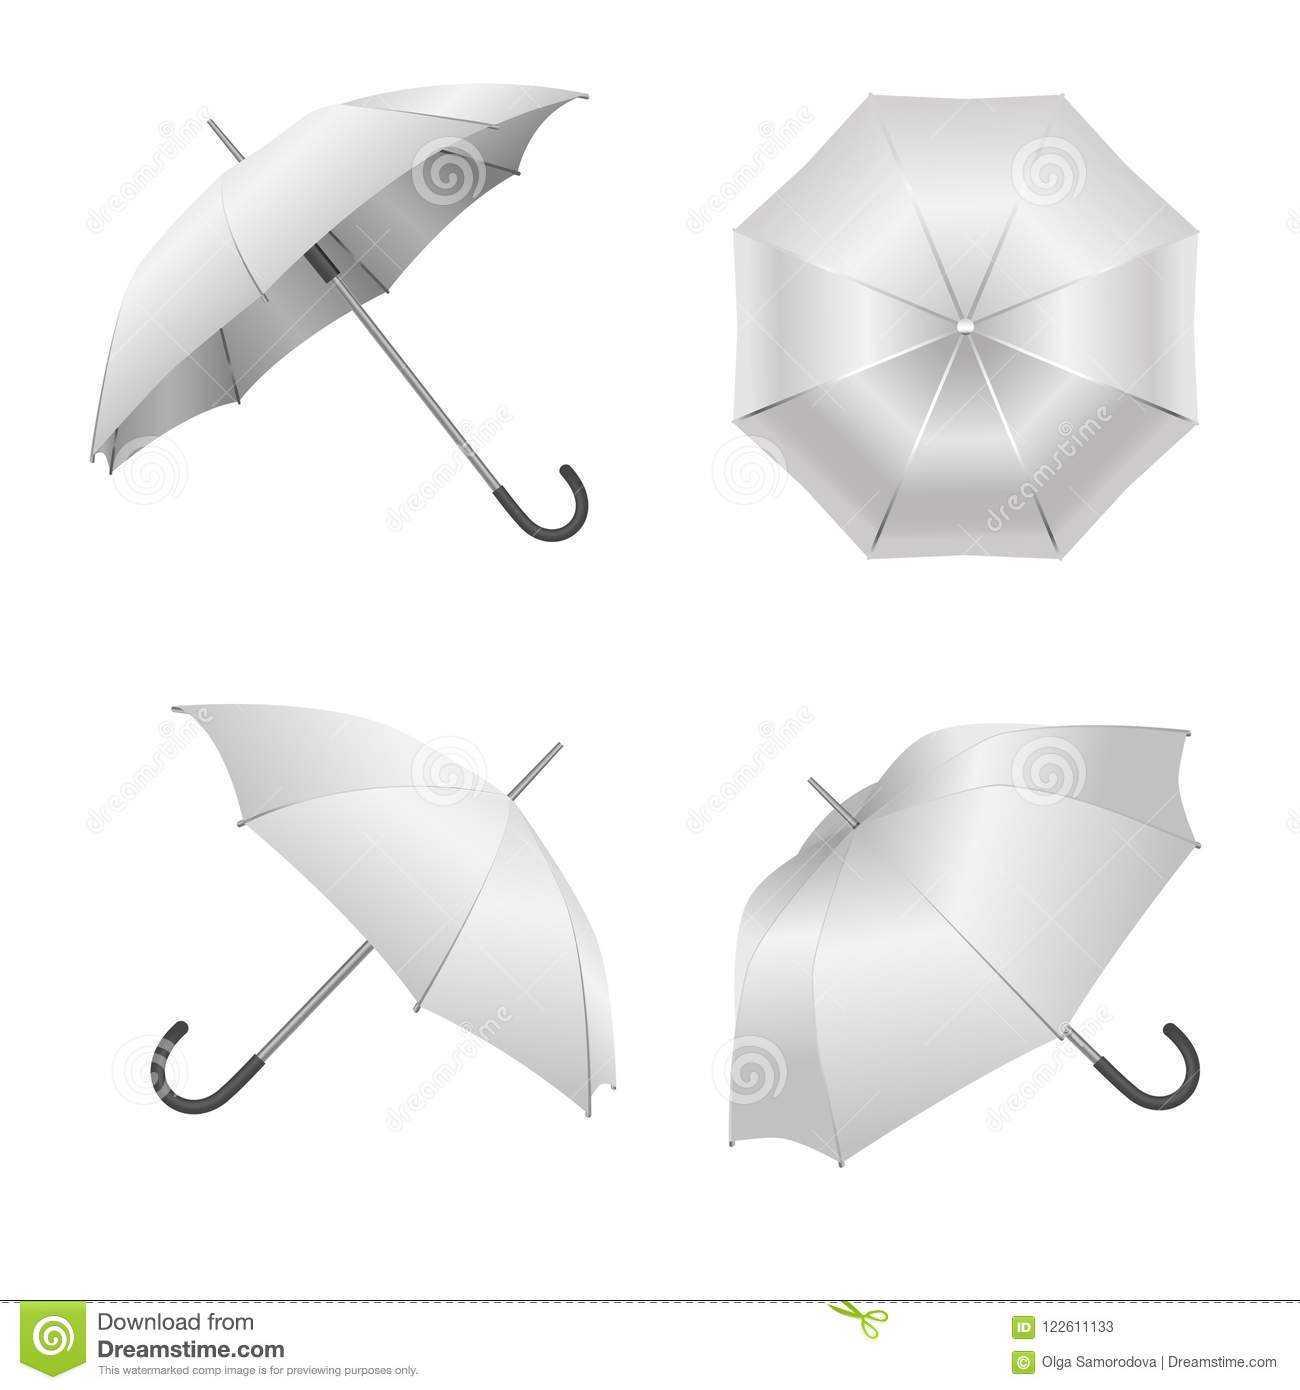 Realistic Detailed 3D White Blank Umbrella Template Mockup Intended For Blank Umbrella Template